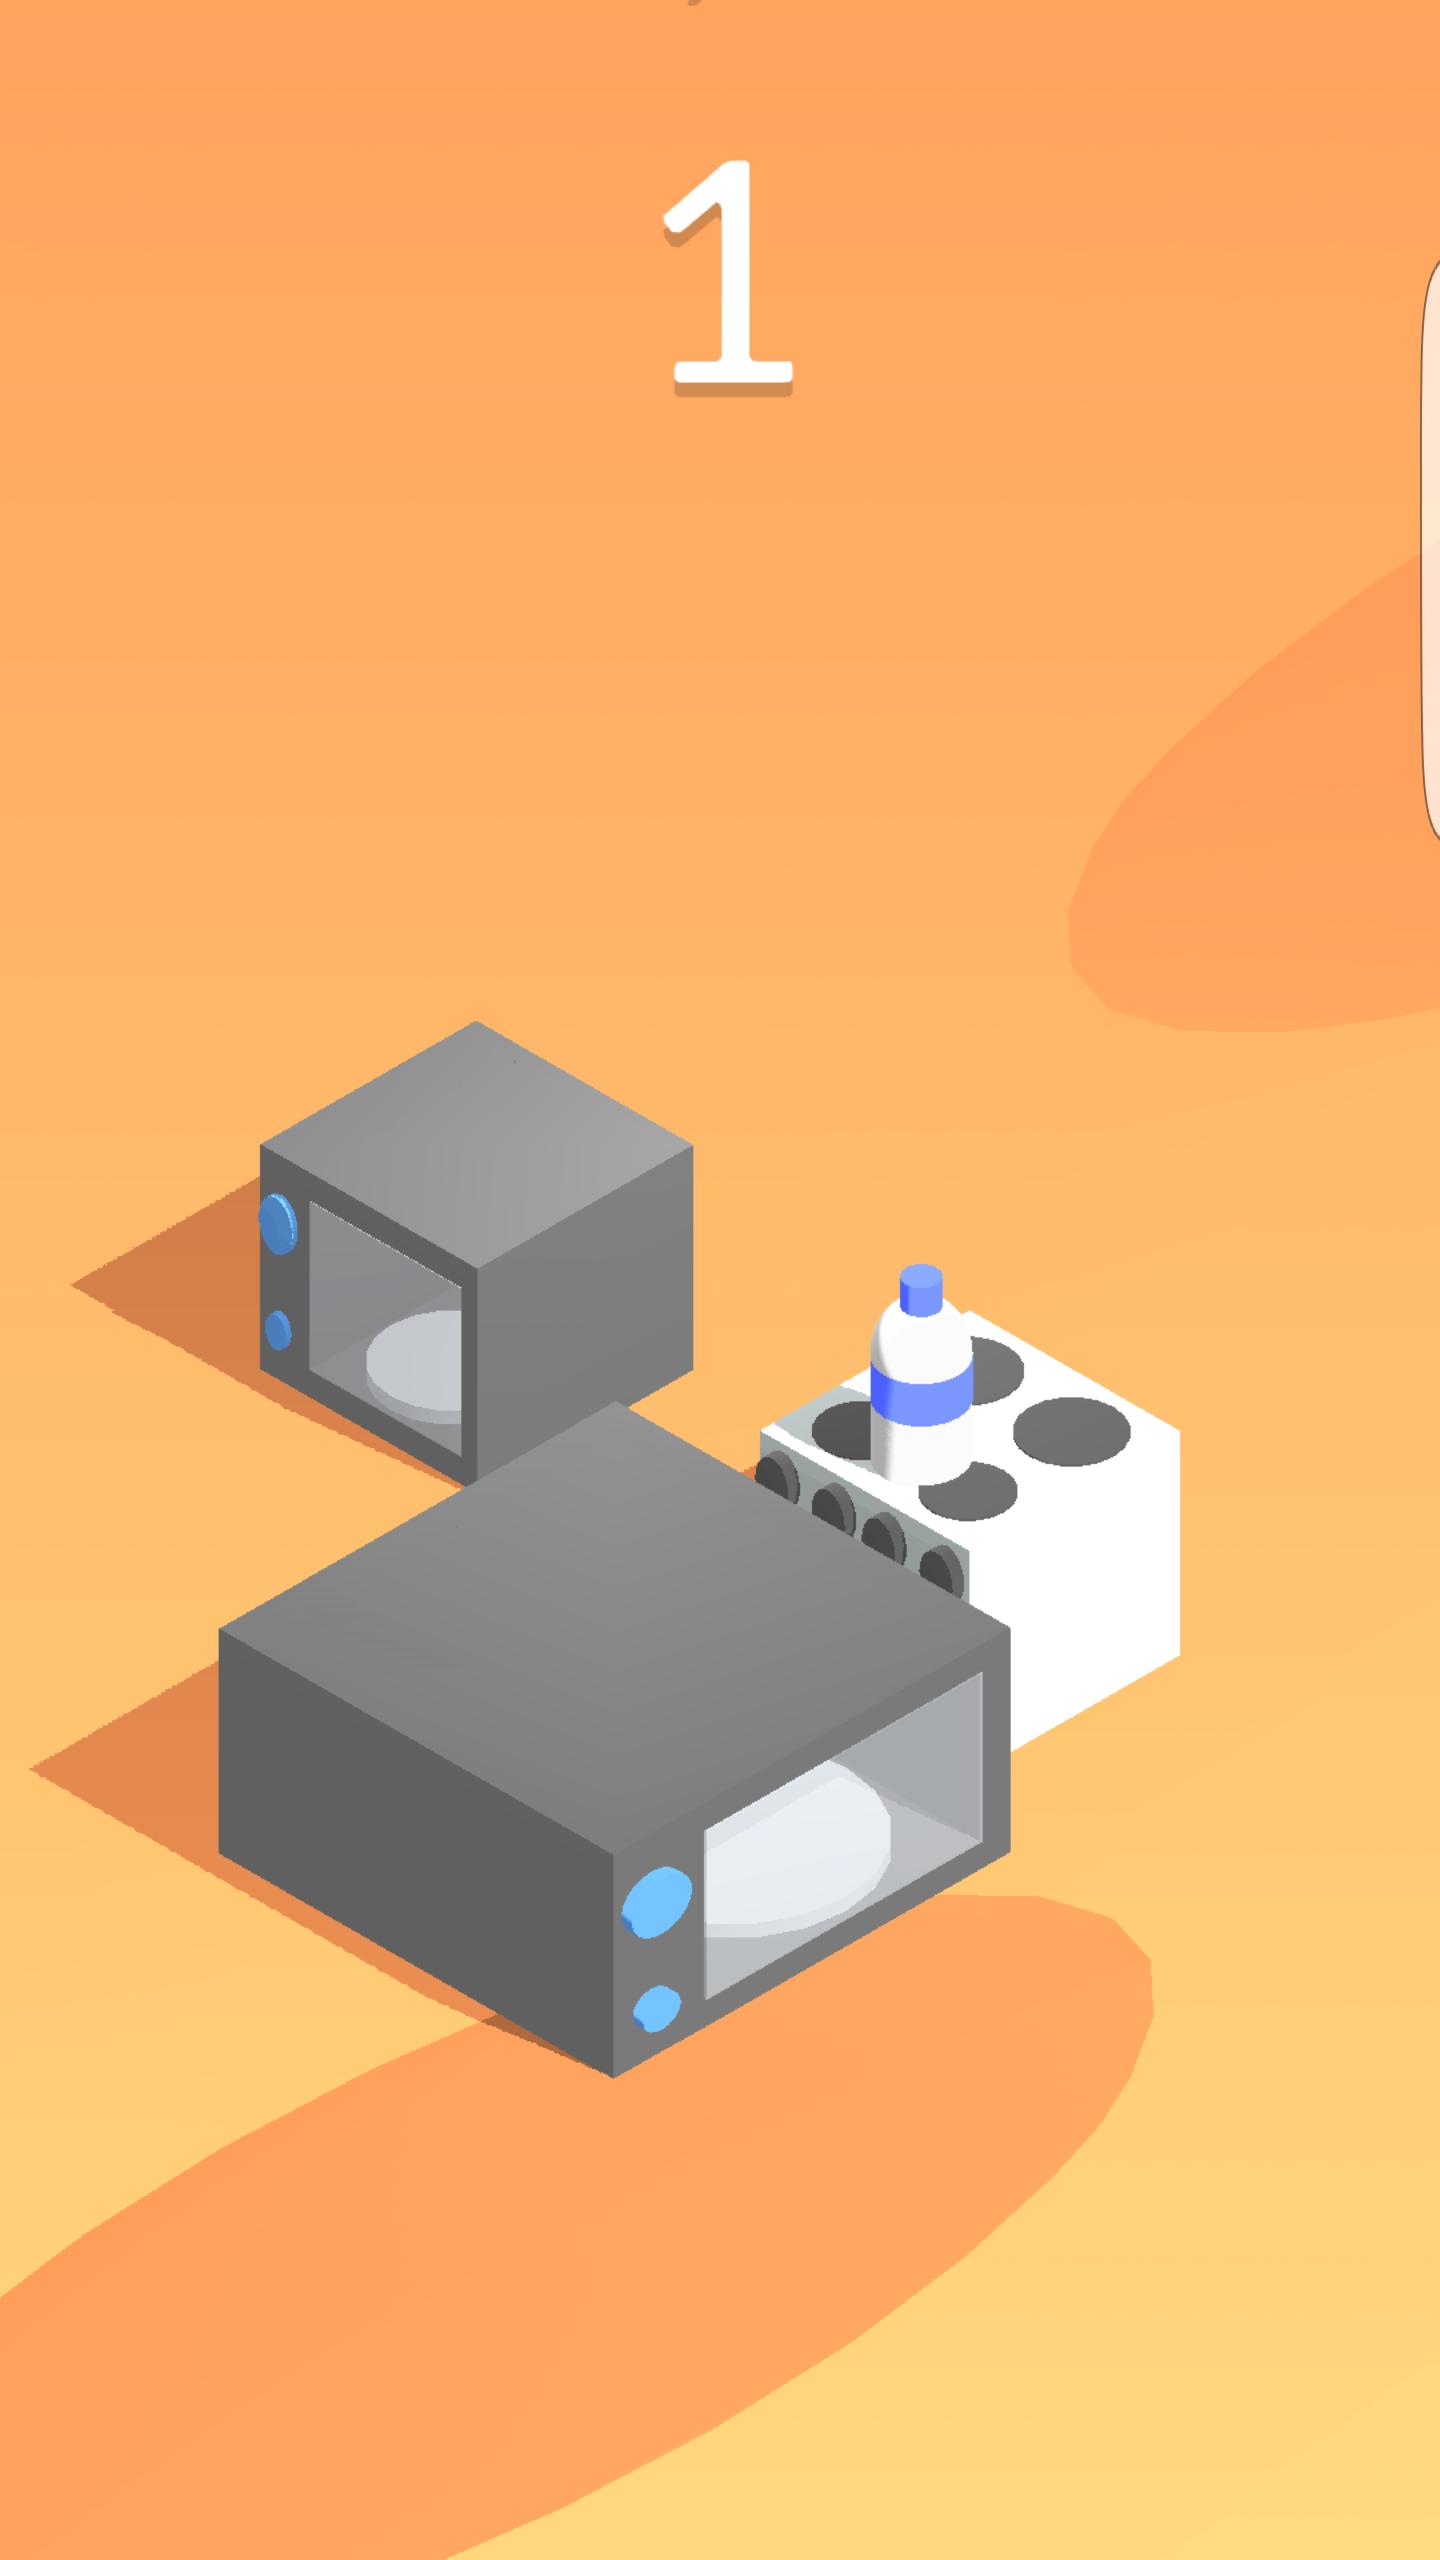 bottle-flip-android-2